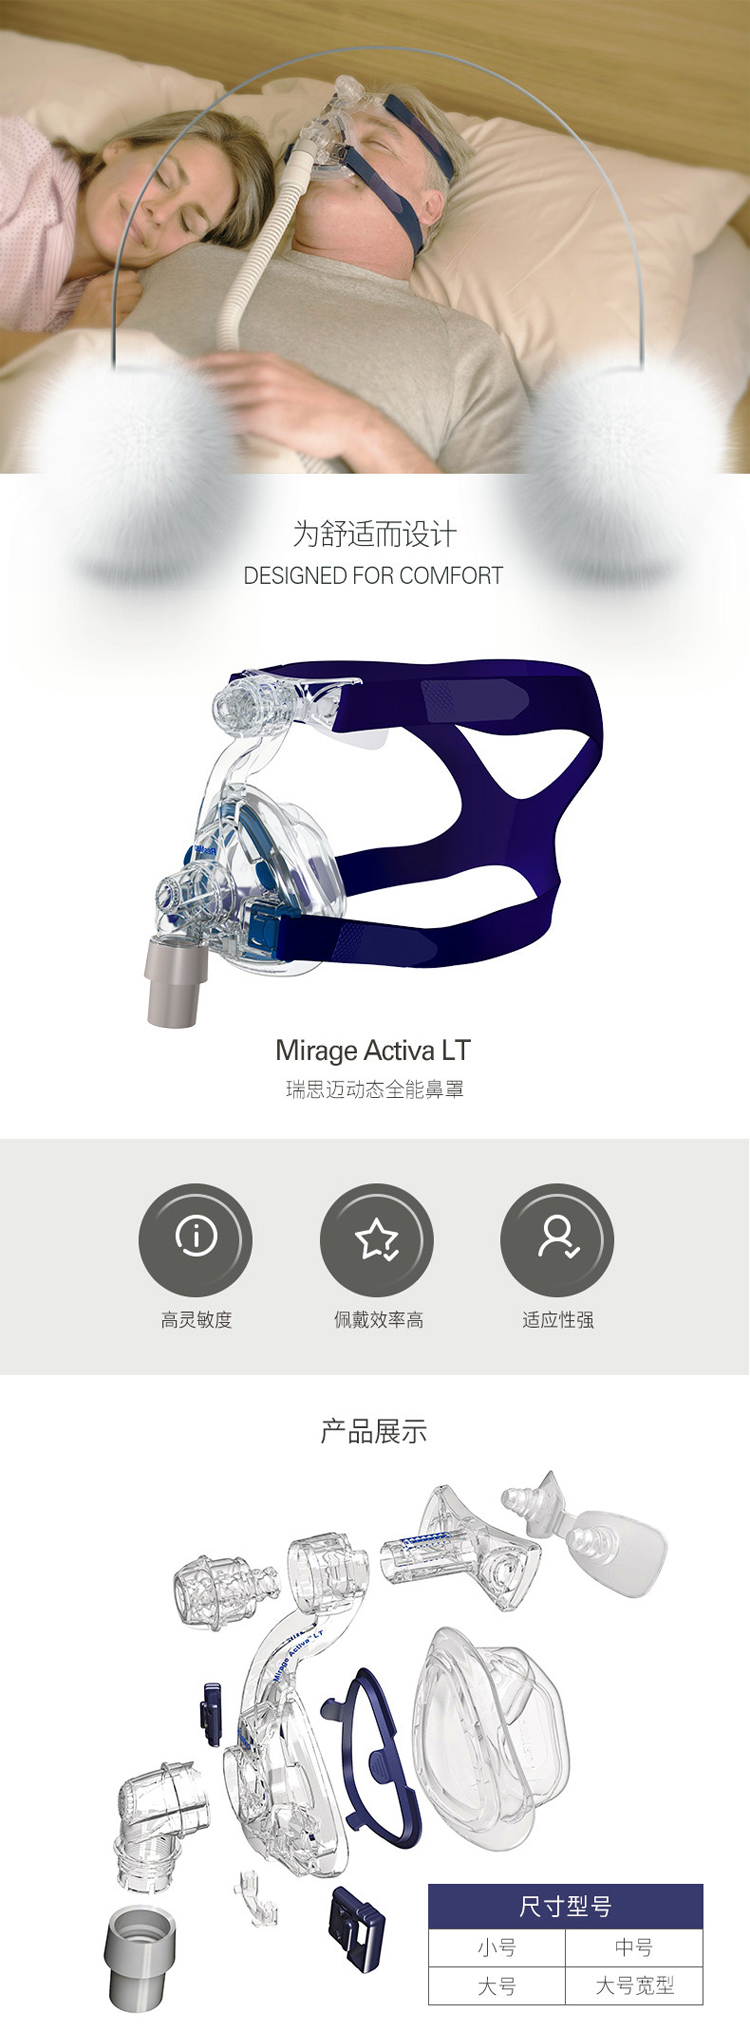 云南呼吸机配件品牌,昆明呼吸机配件品牌